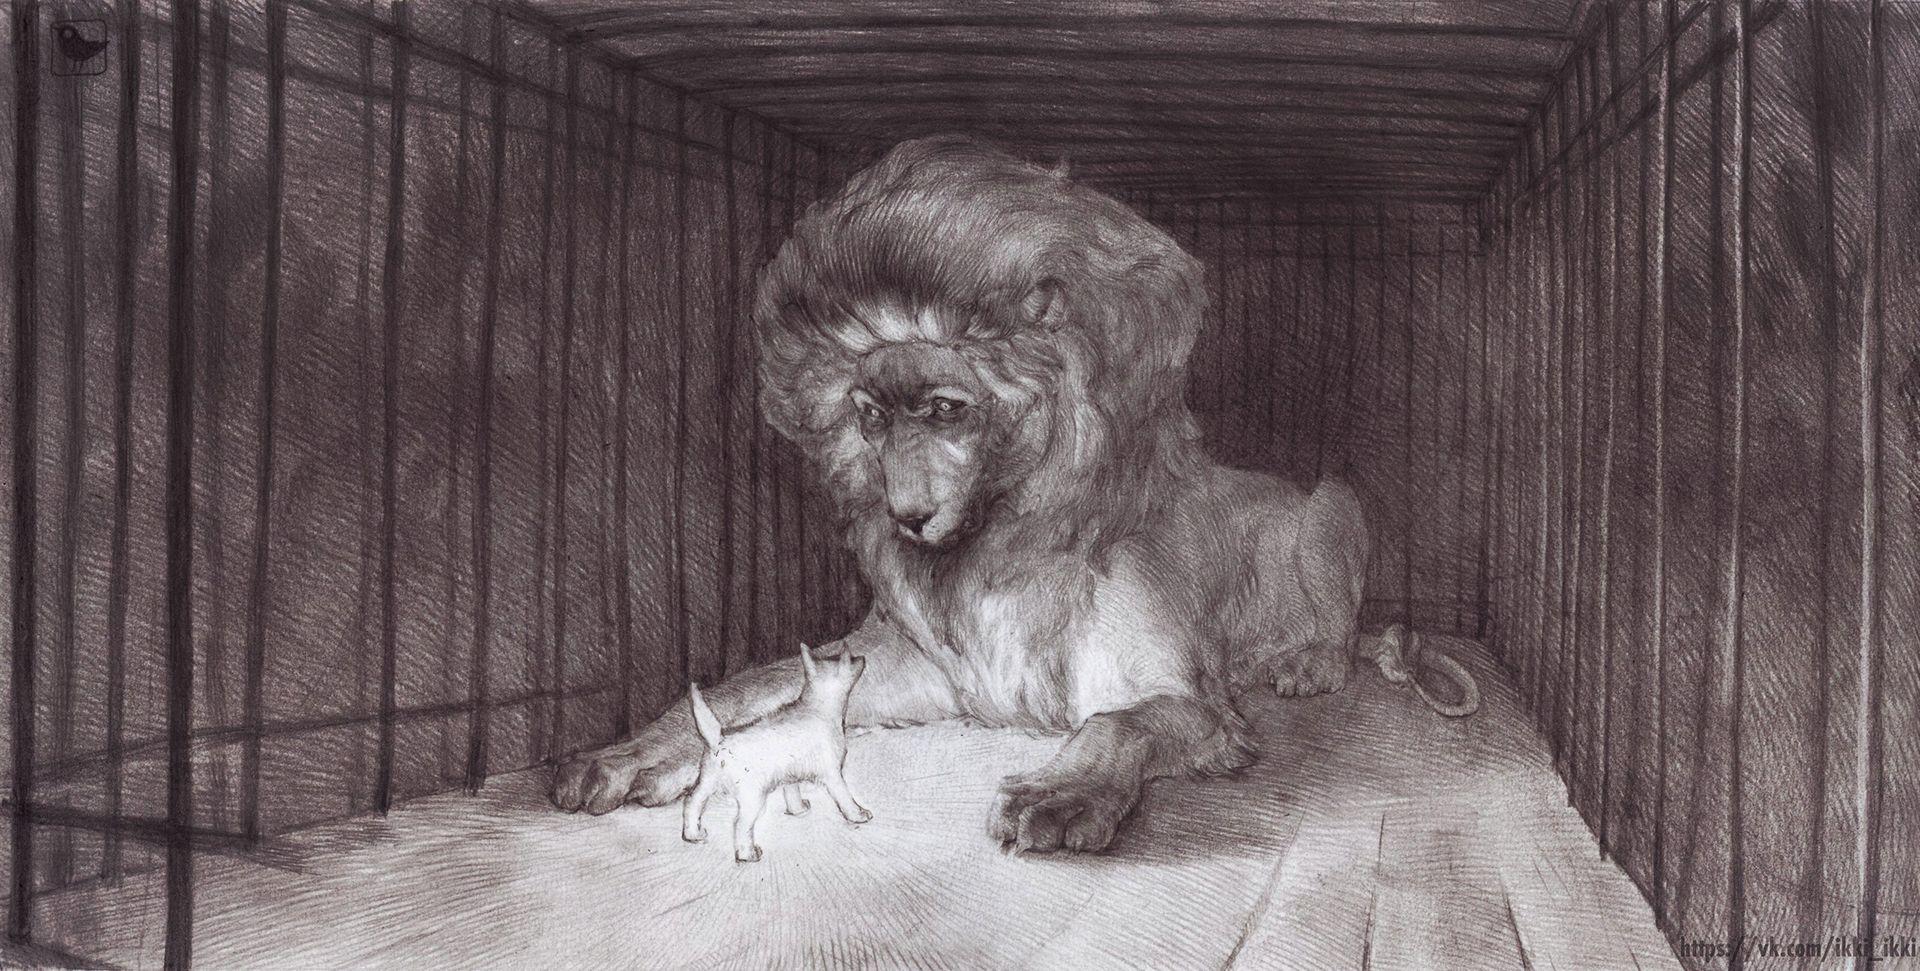 Картинки к произведению лев и собака